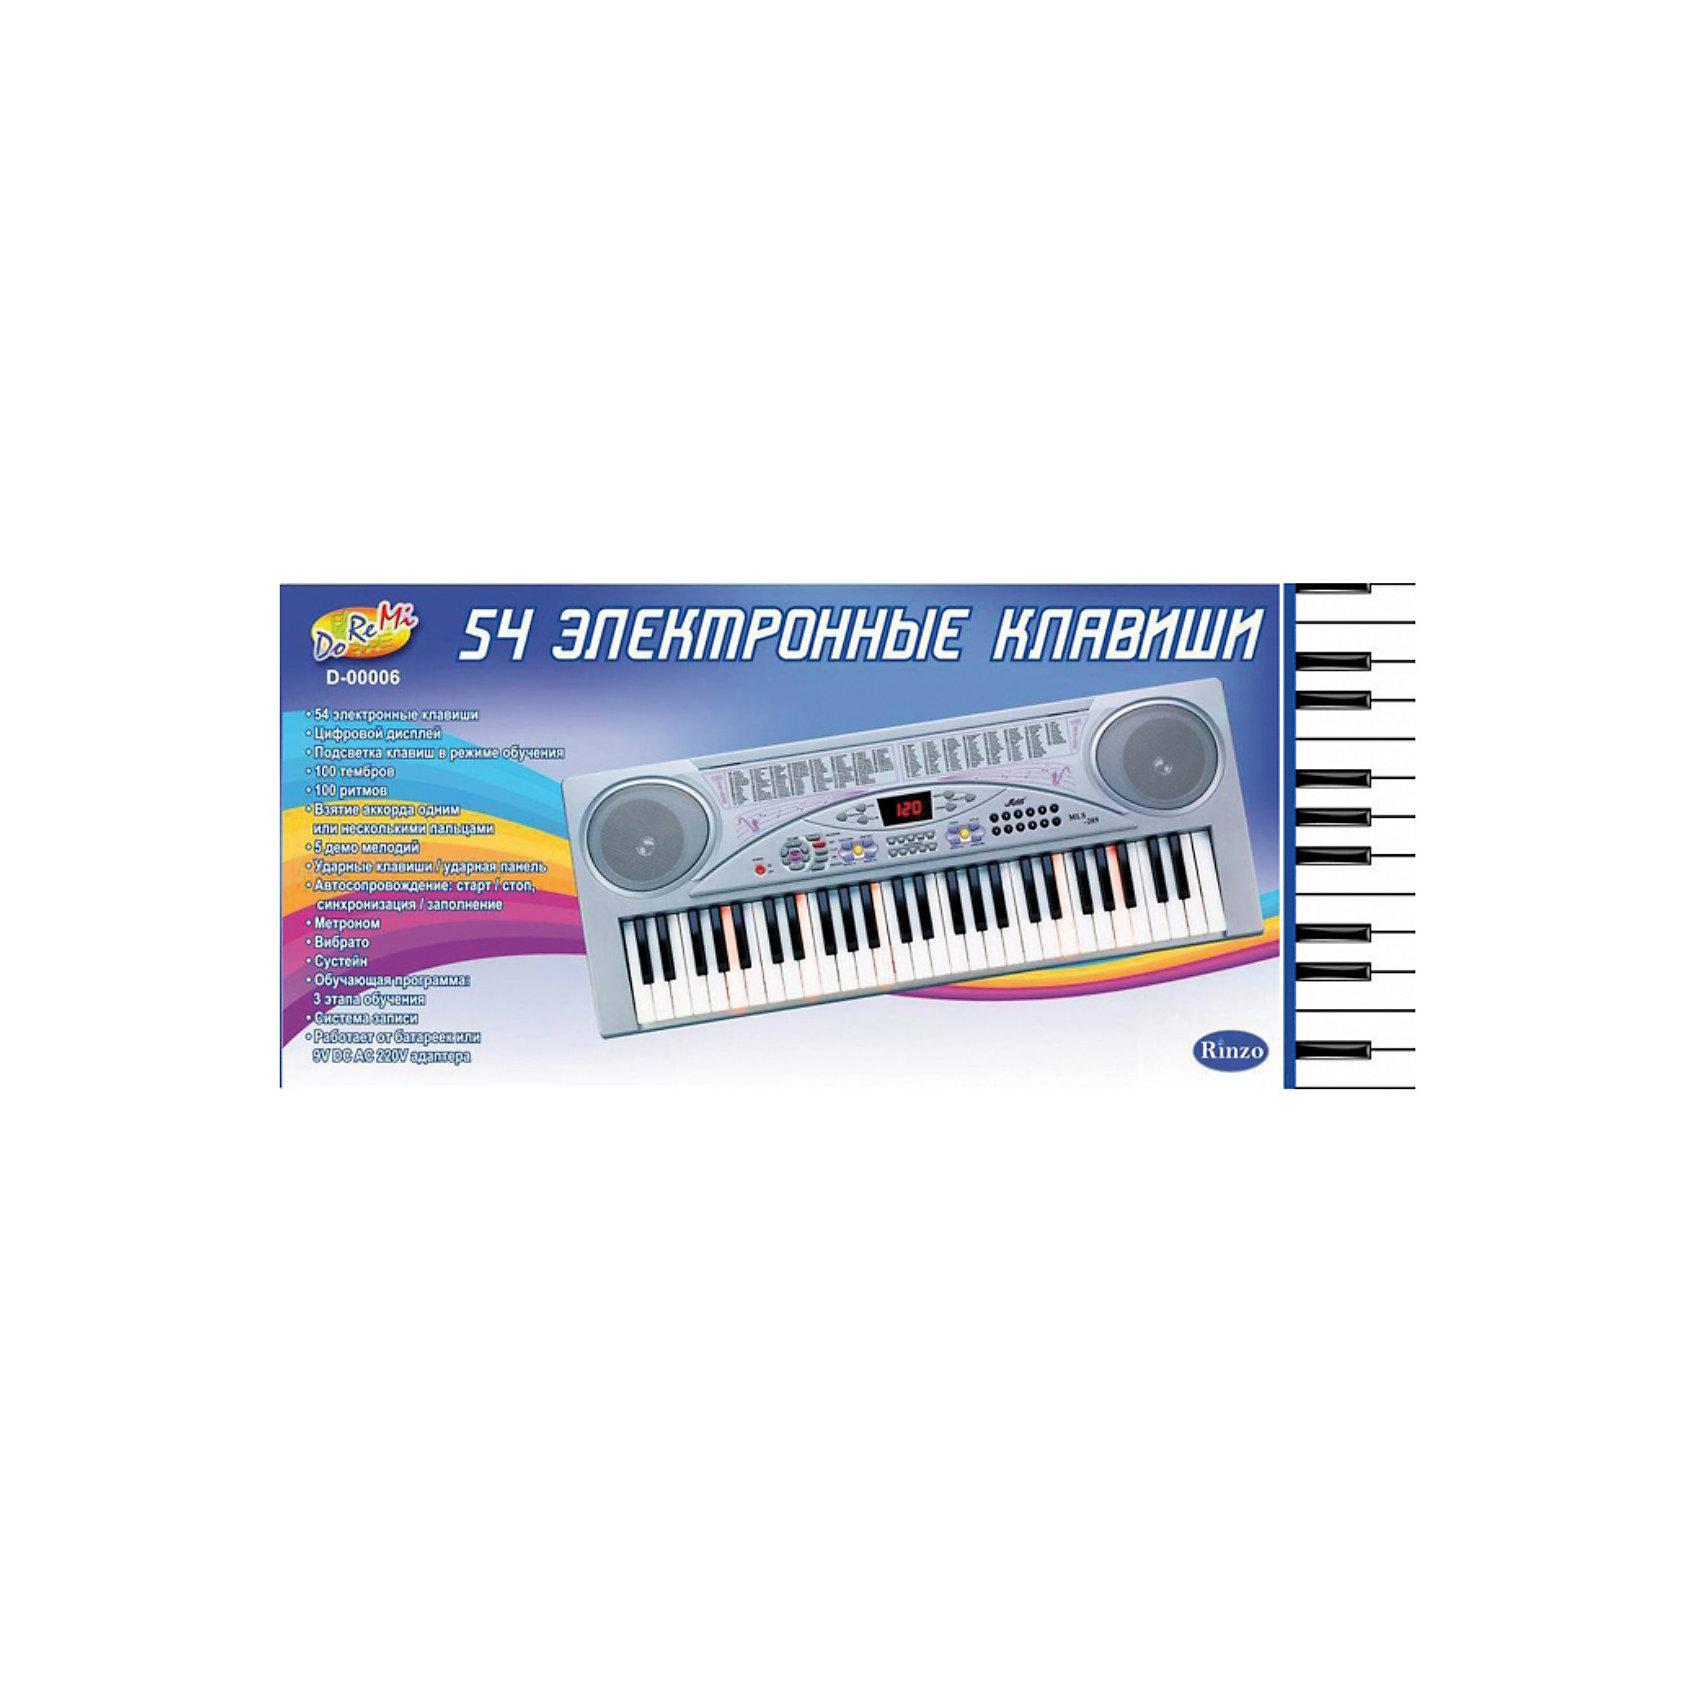 DoReMi Синтезатор с микрофоном, 54 клавиши